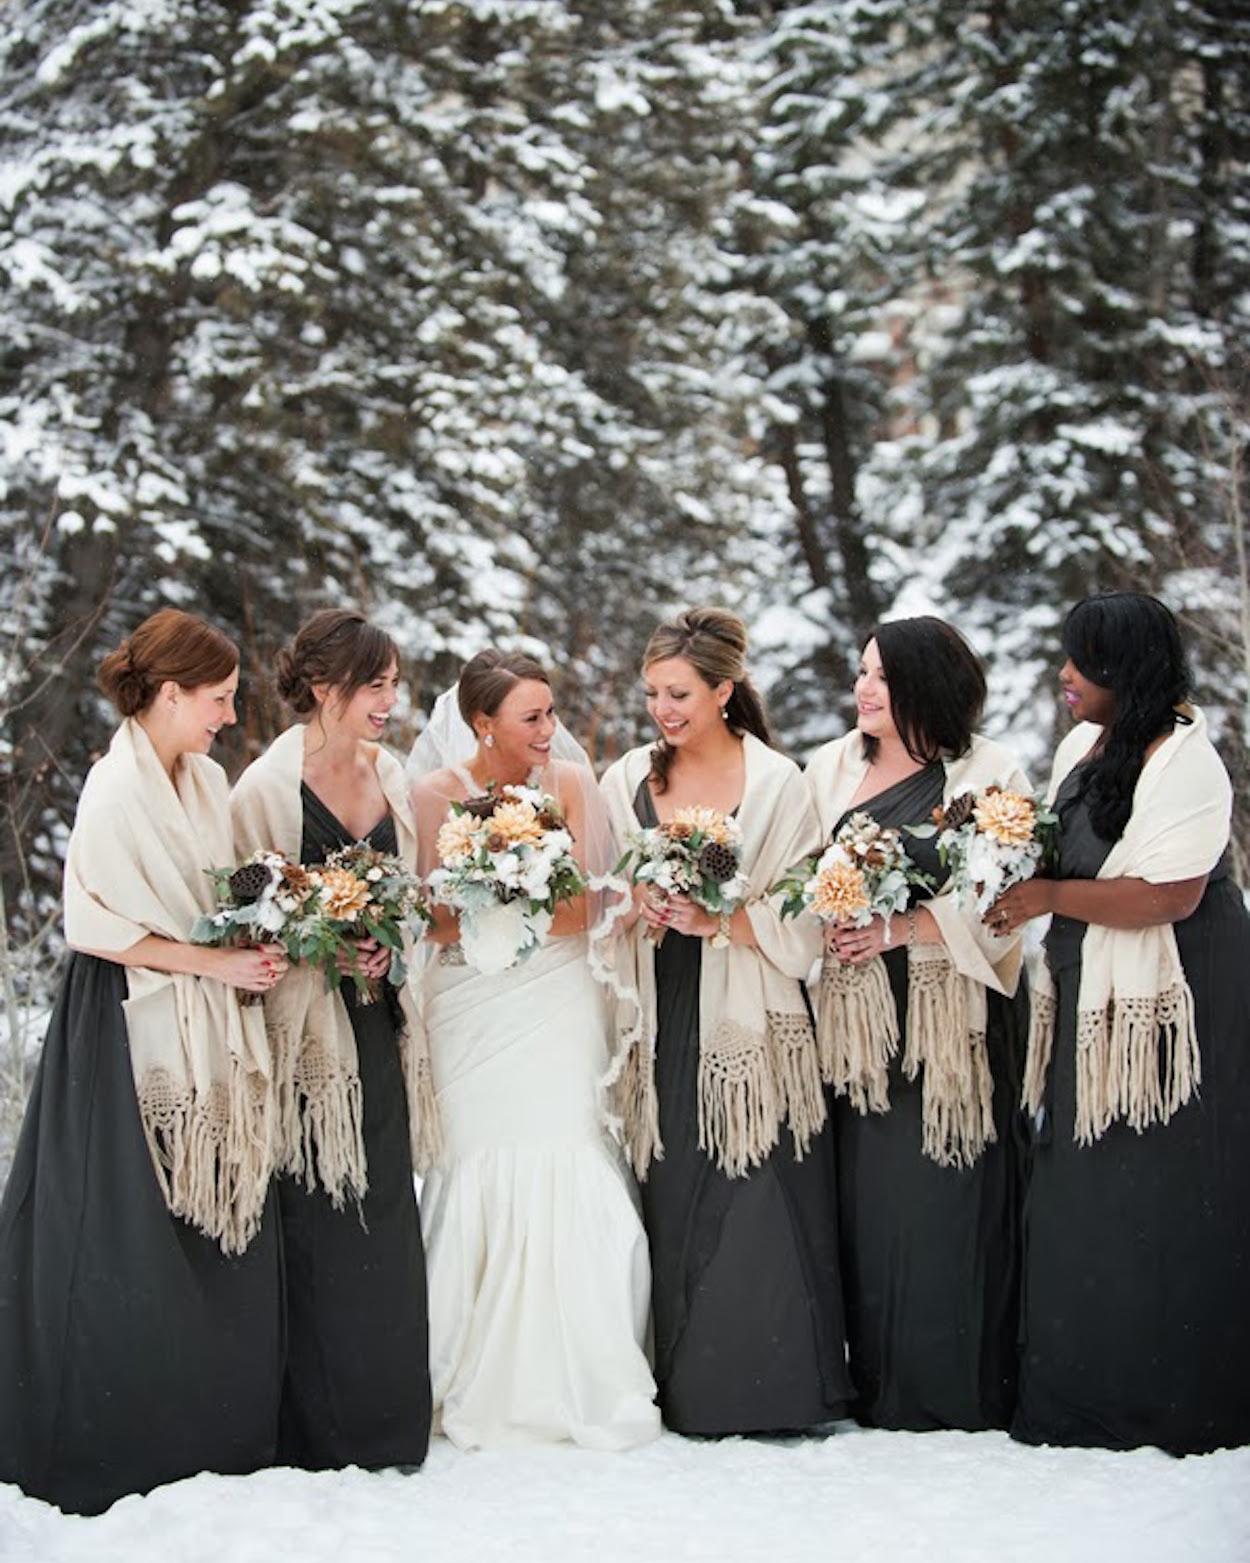 7 Simple Ways to Make Your Winter Wedding Cozy